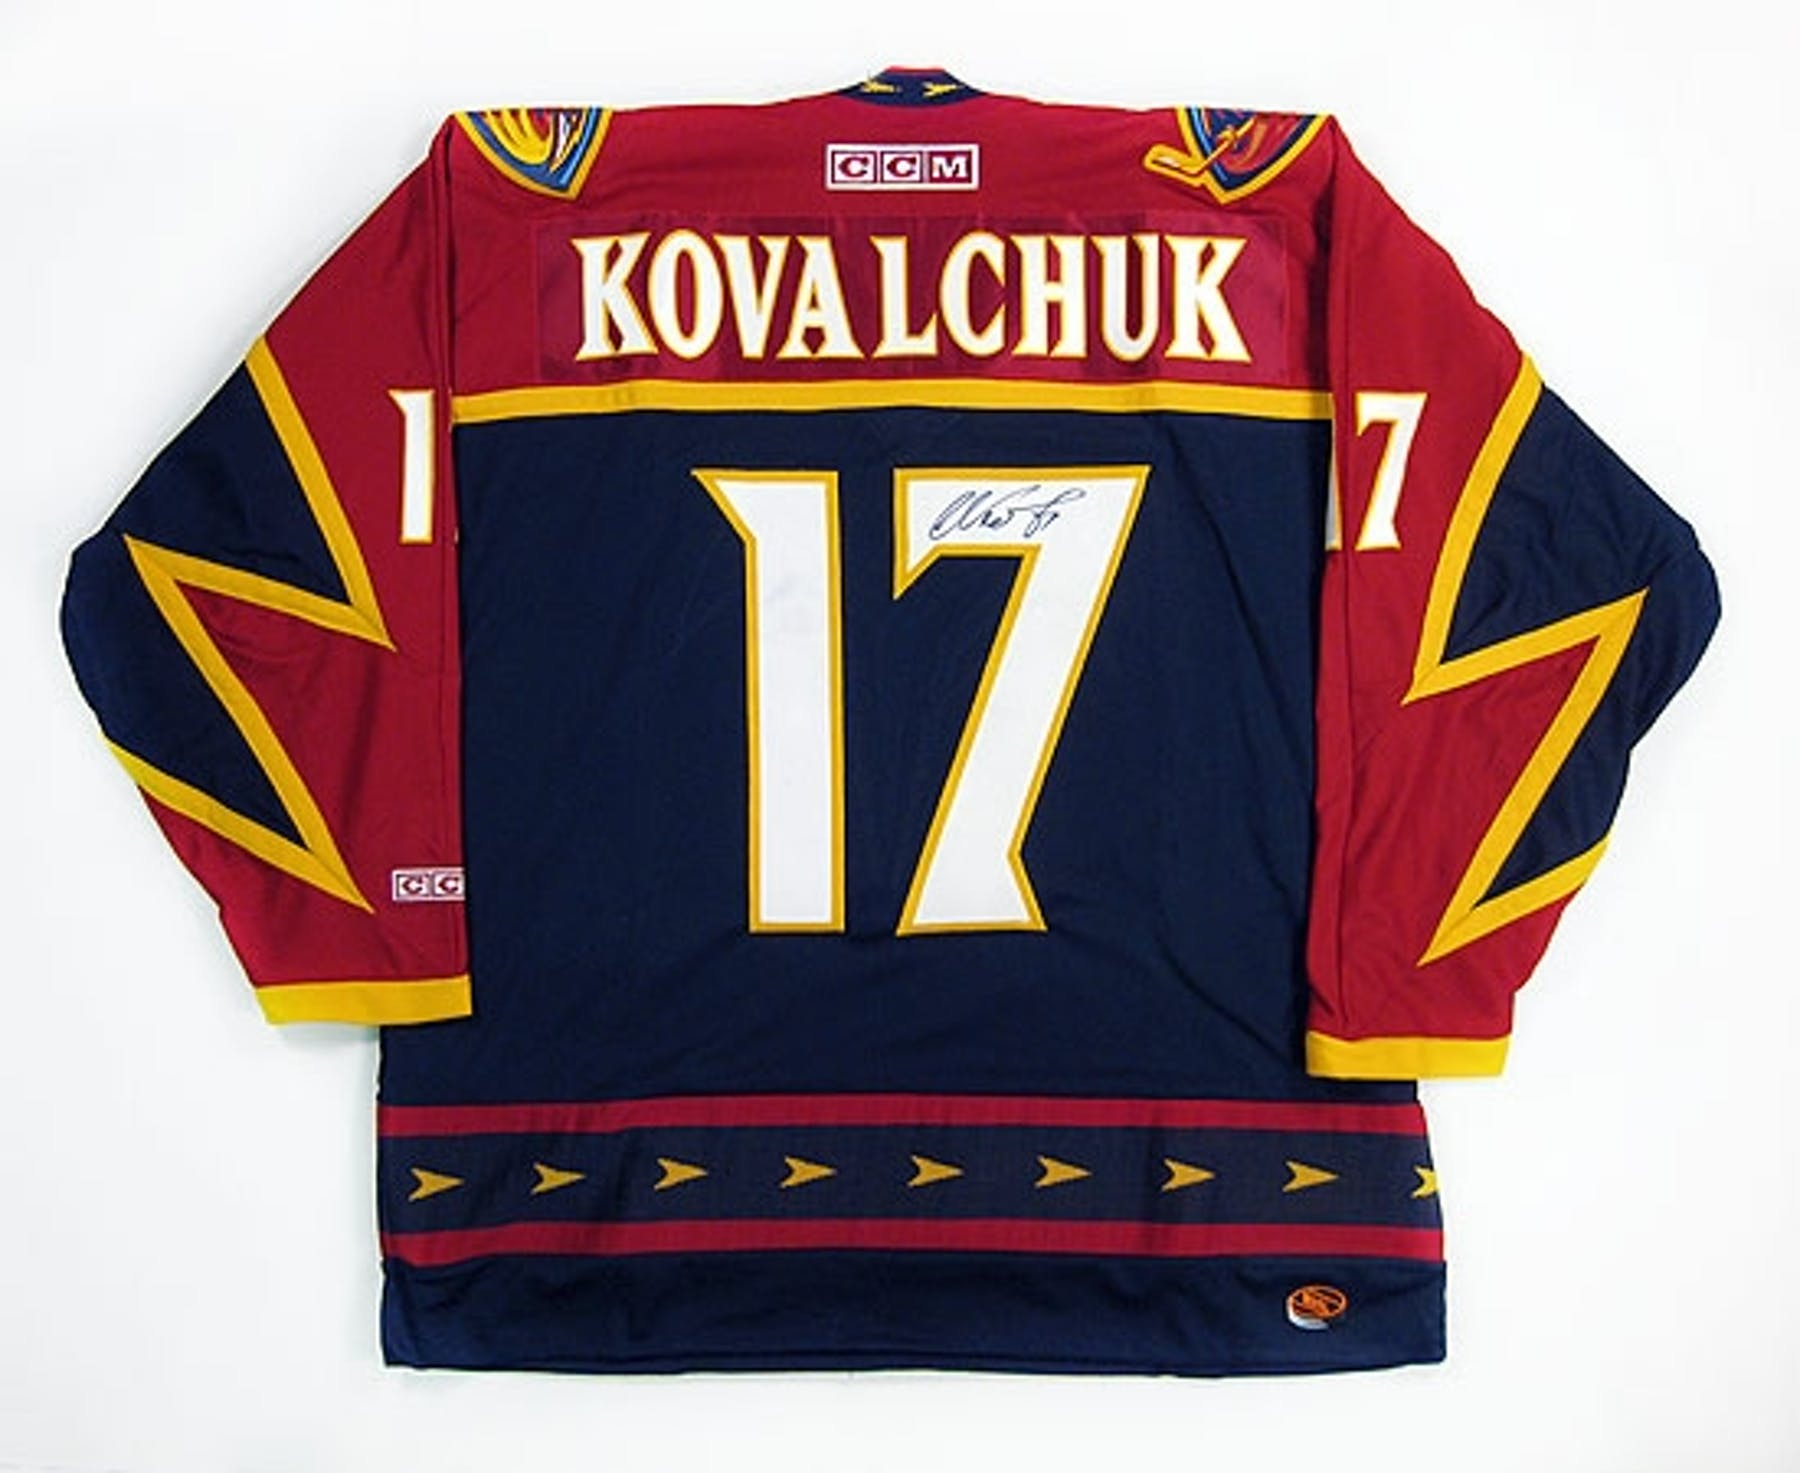 Ilya Kovalchuk Autographed Atlanta Thrashers CCM Hockey Jersey ... 1a85c5c8d